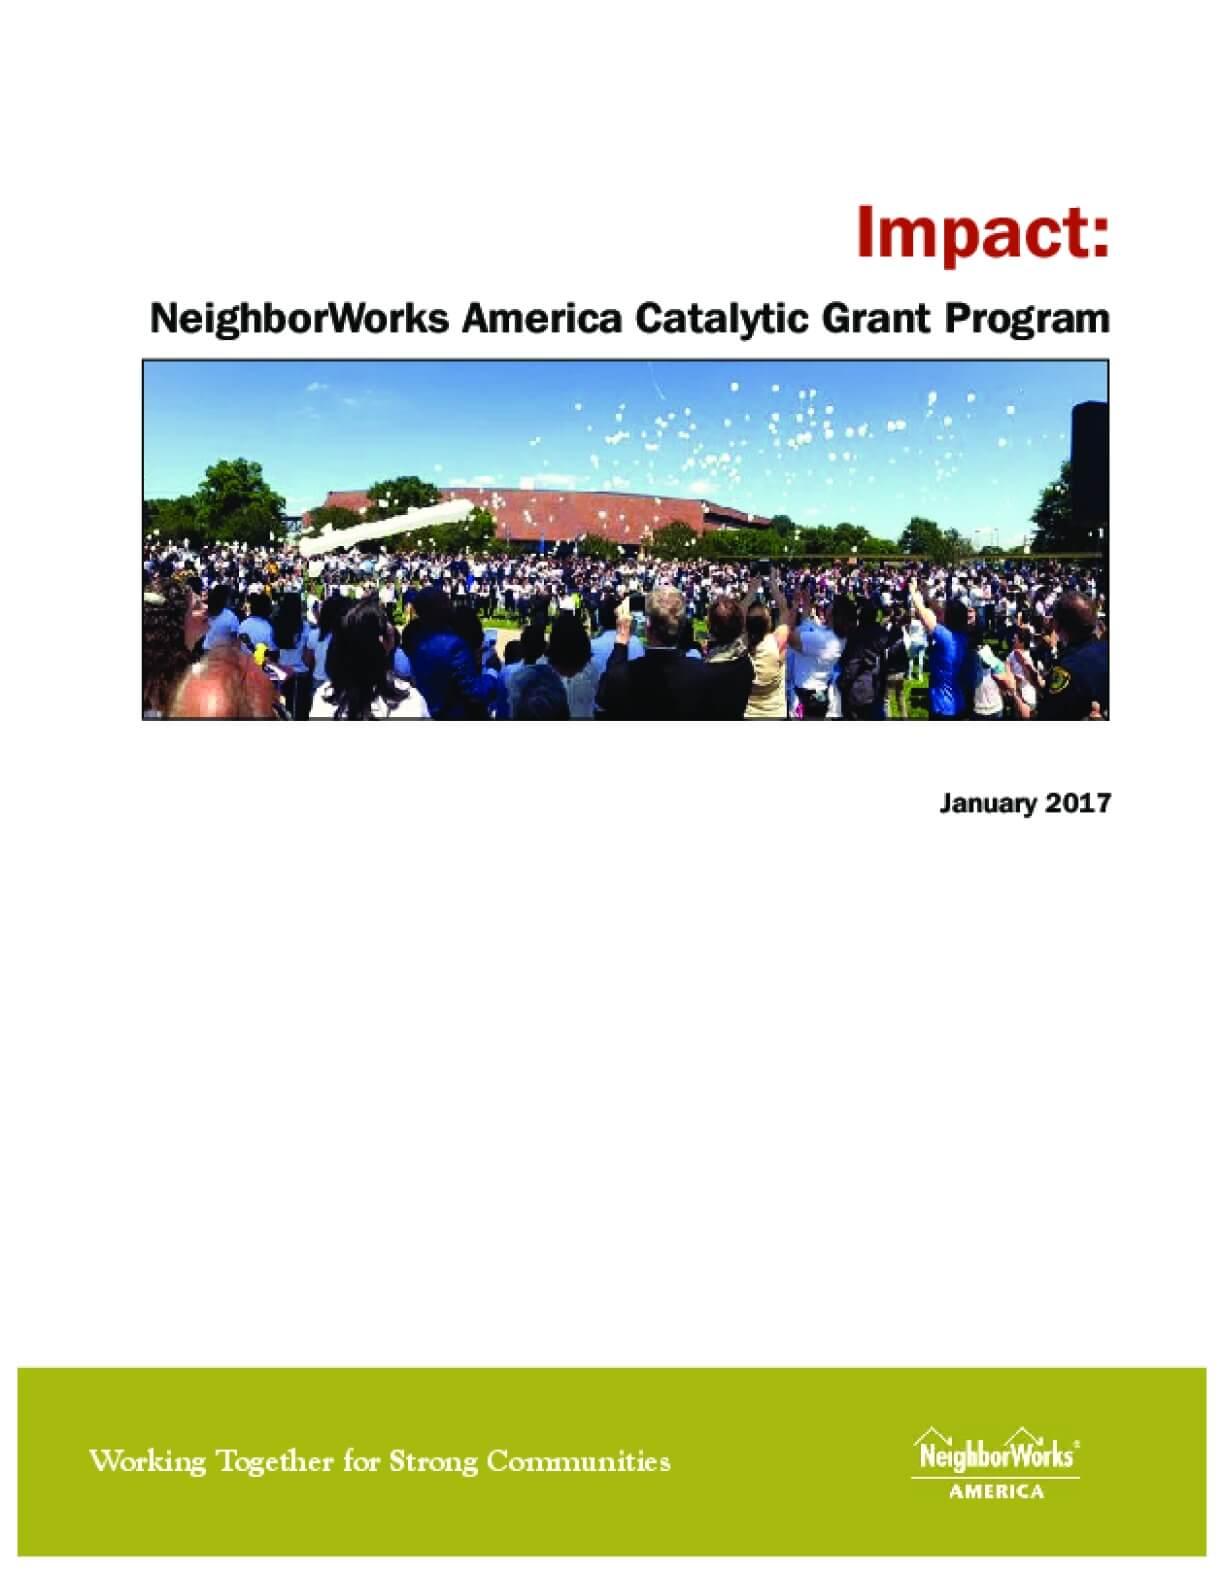 Impact of the NeighborWorks America Catalytic Grant Program